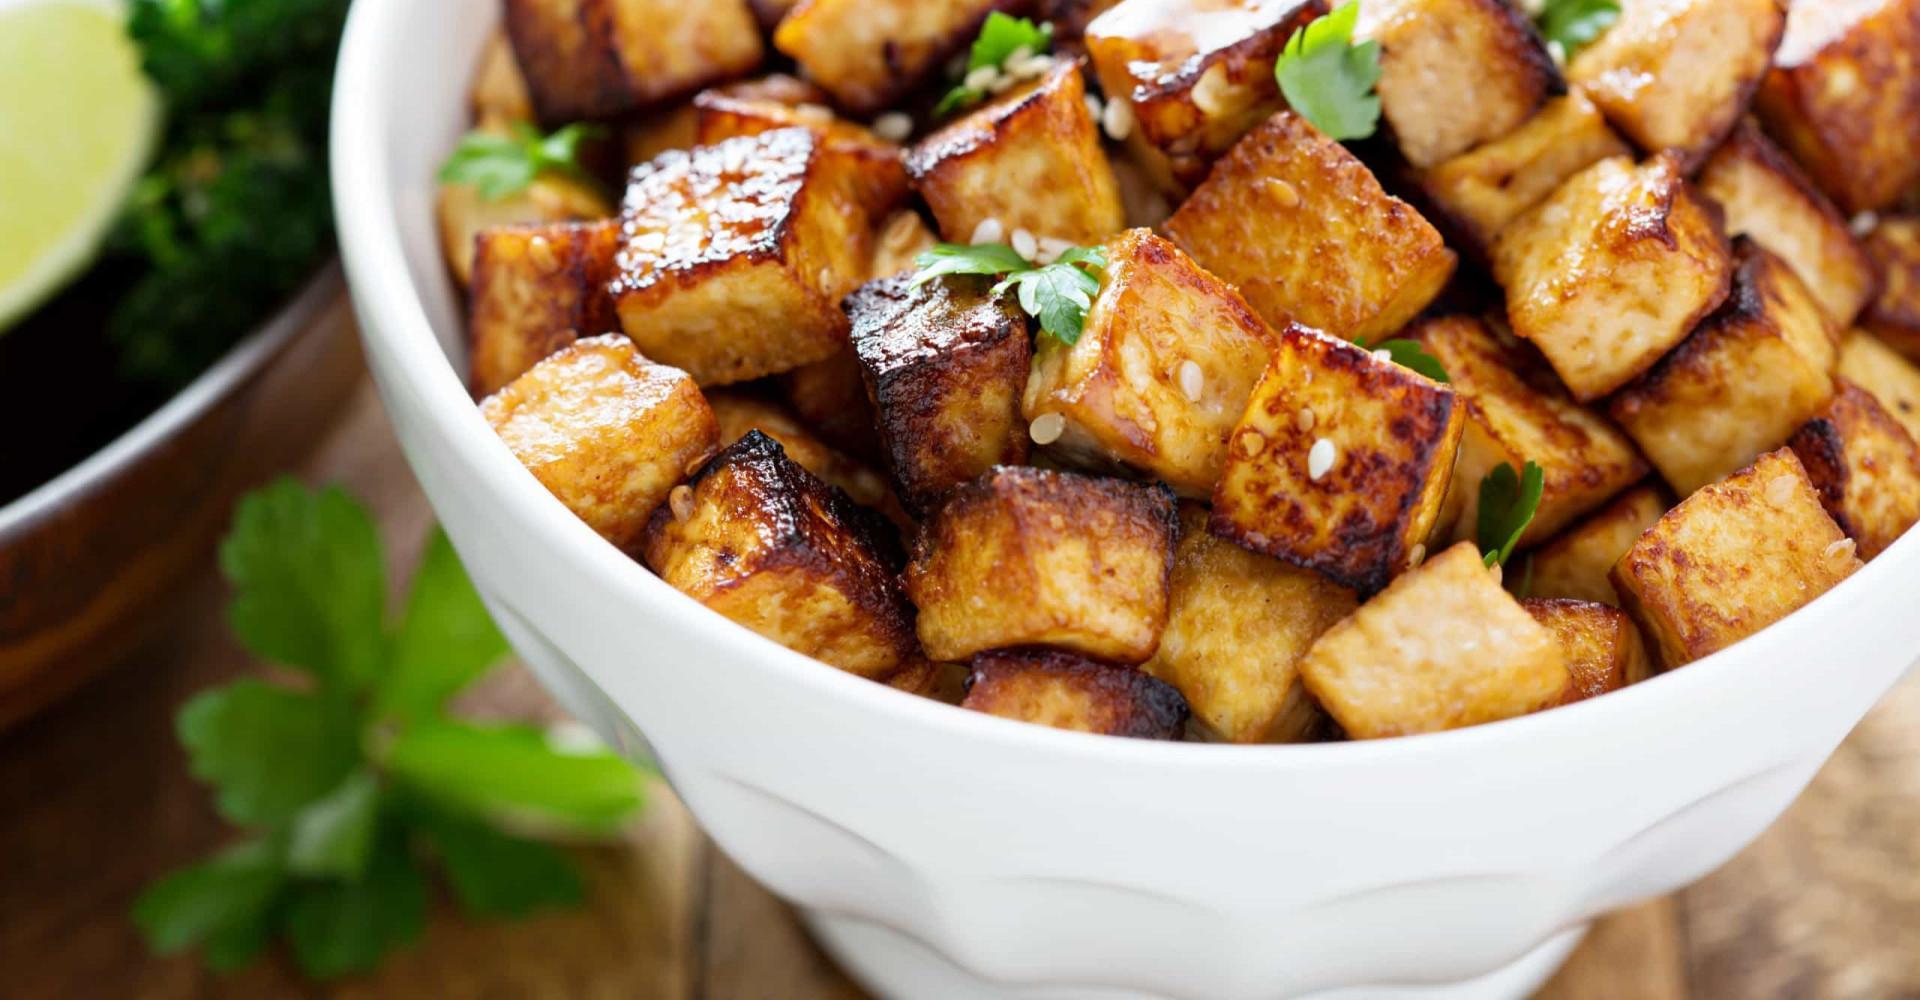 Zo geef je tofu smaak